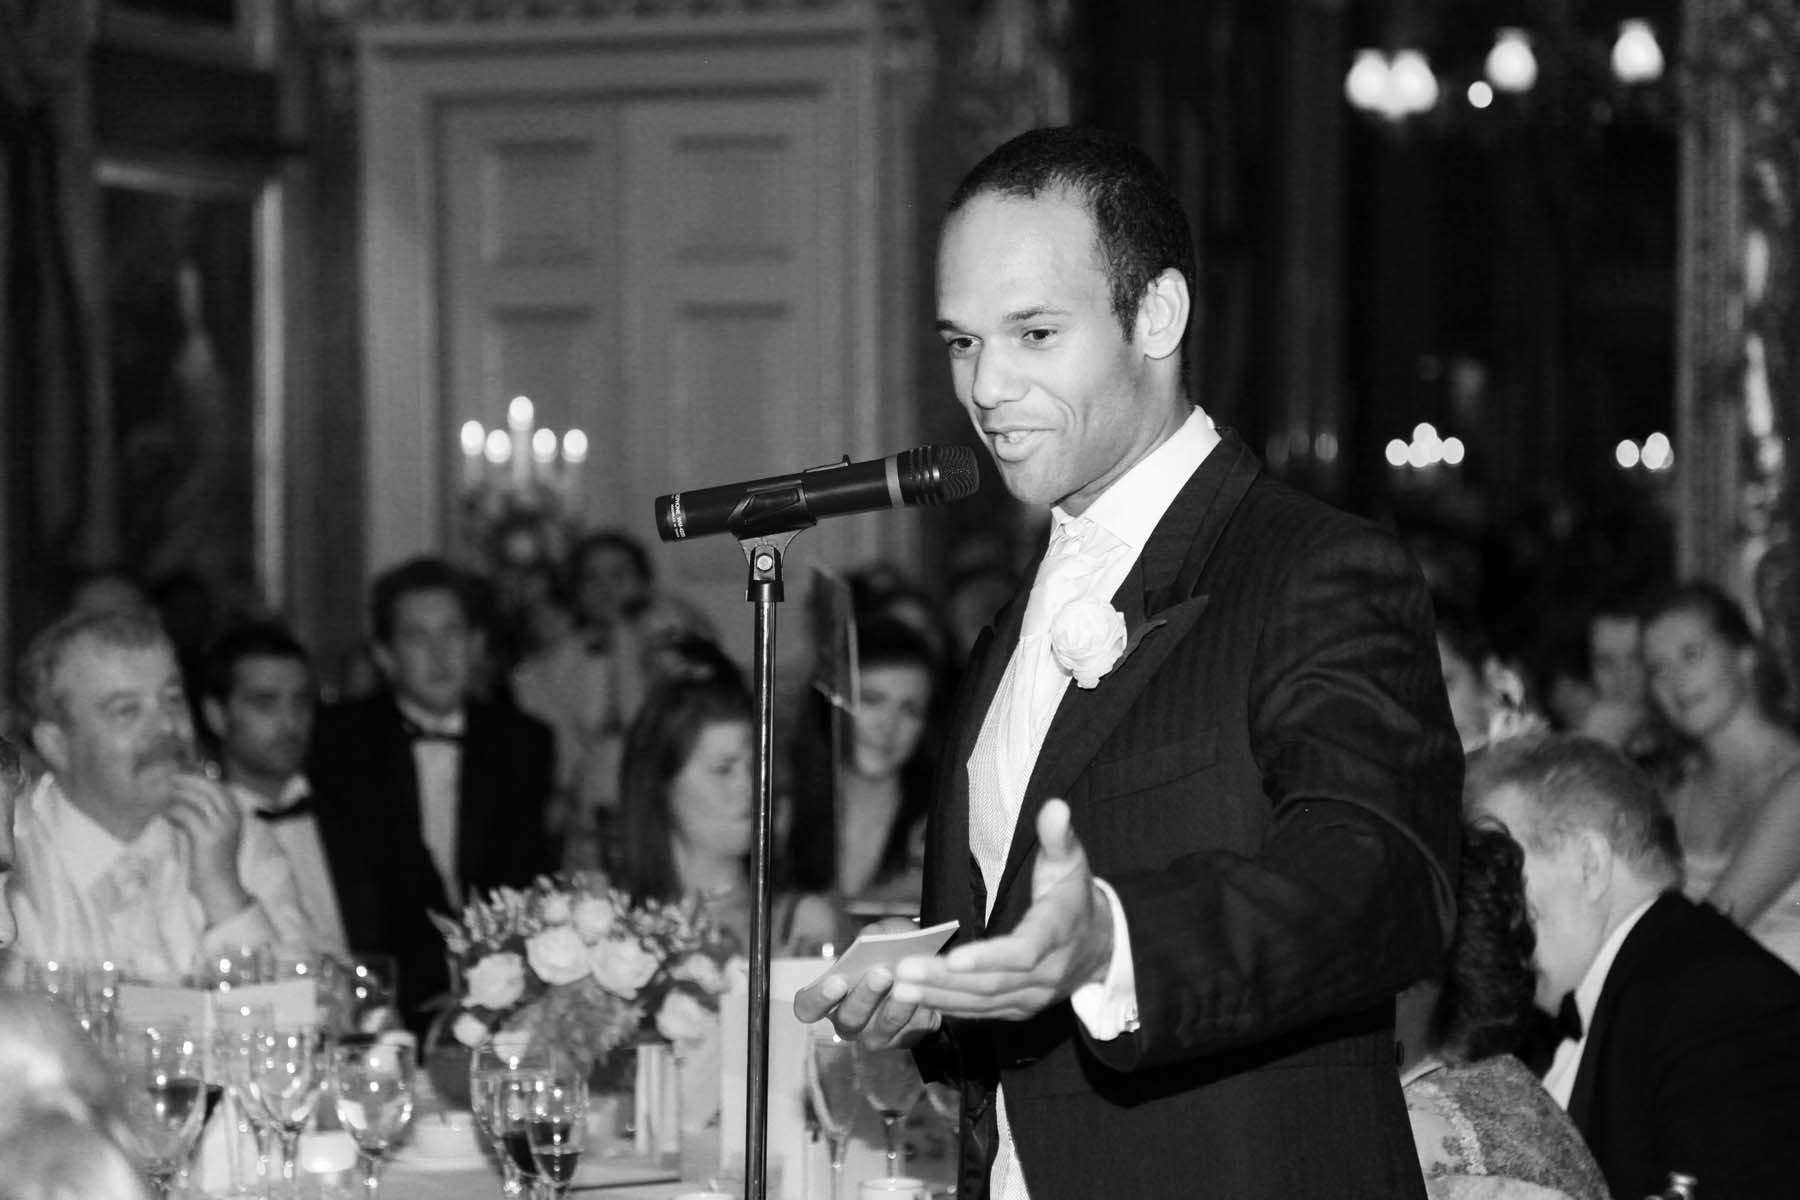 Sussex & Surrey Wedding Photographer - Guests & Groups (37)